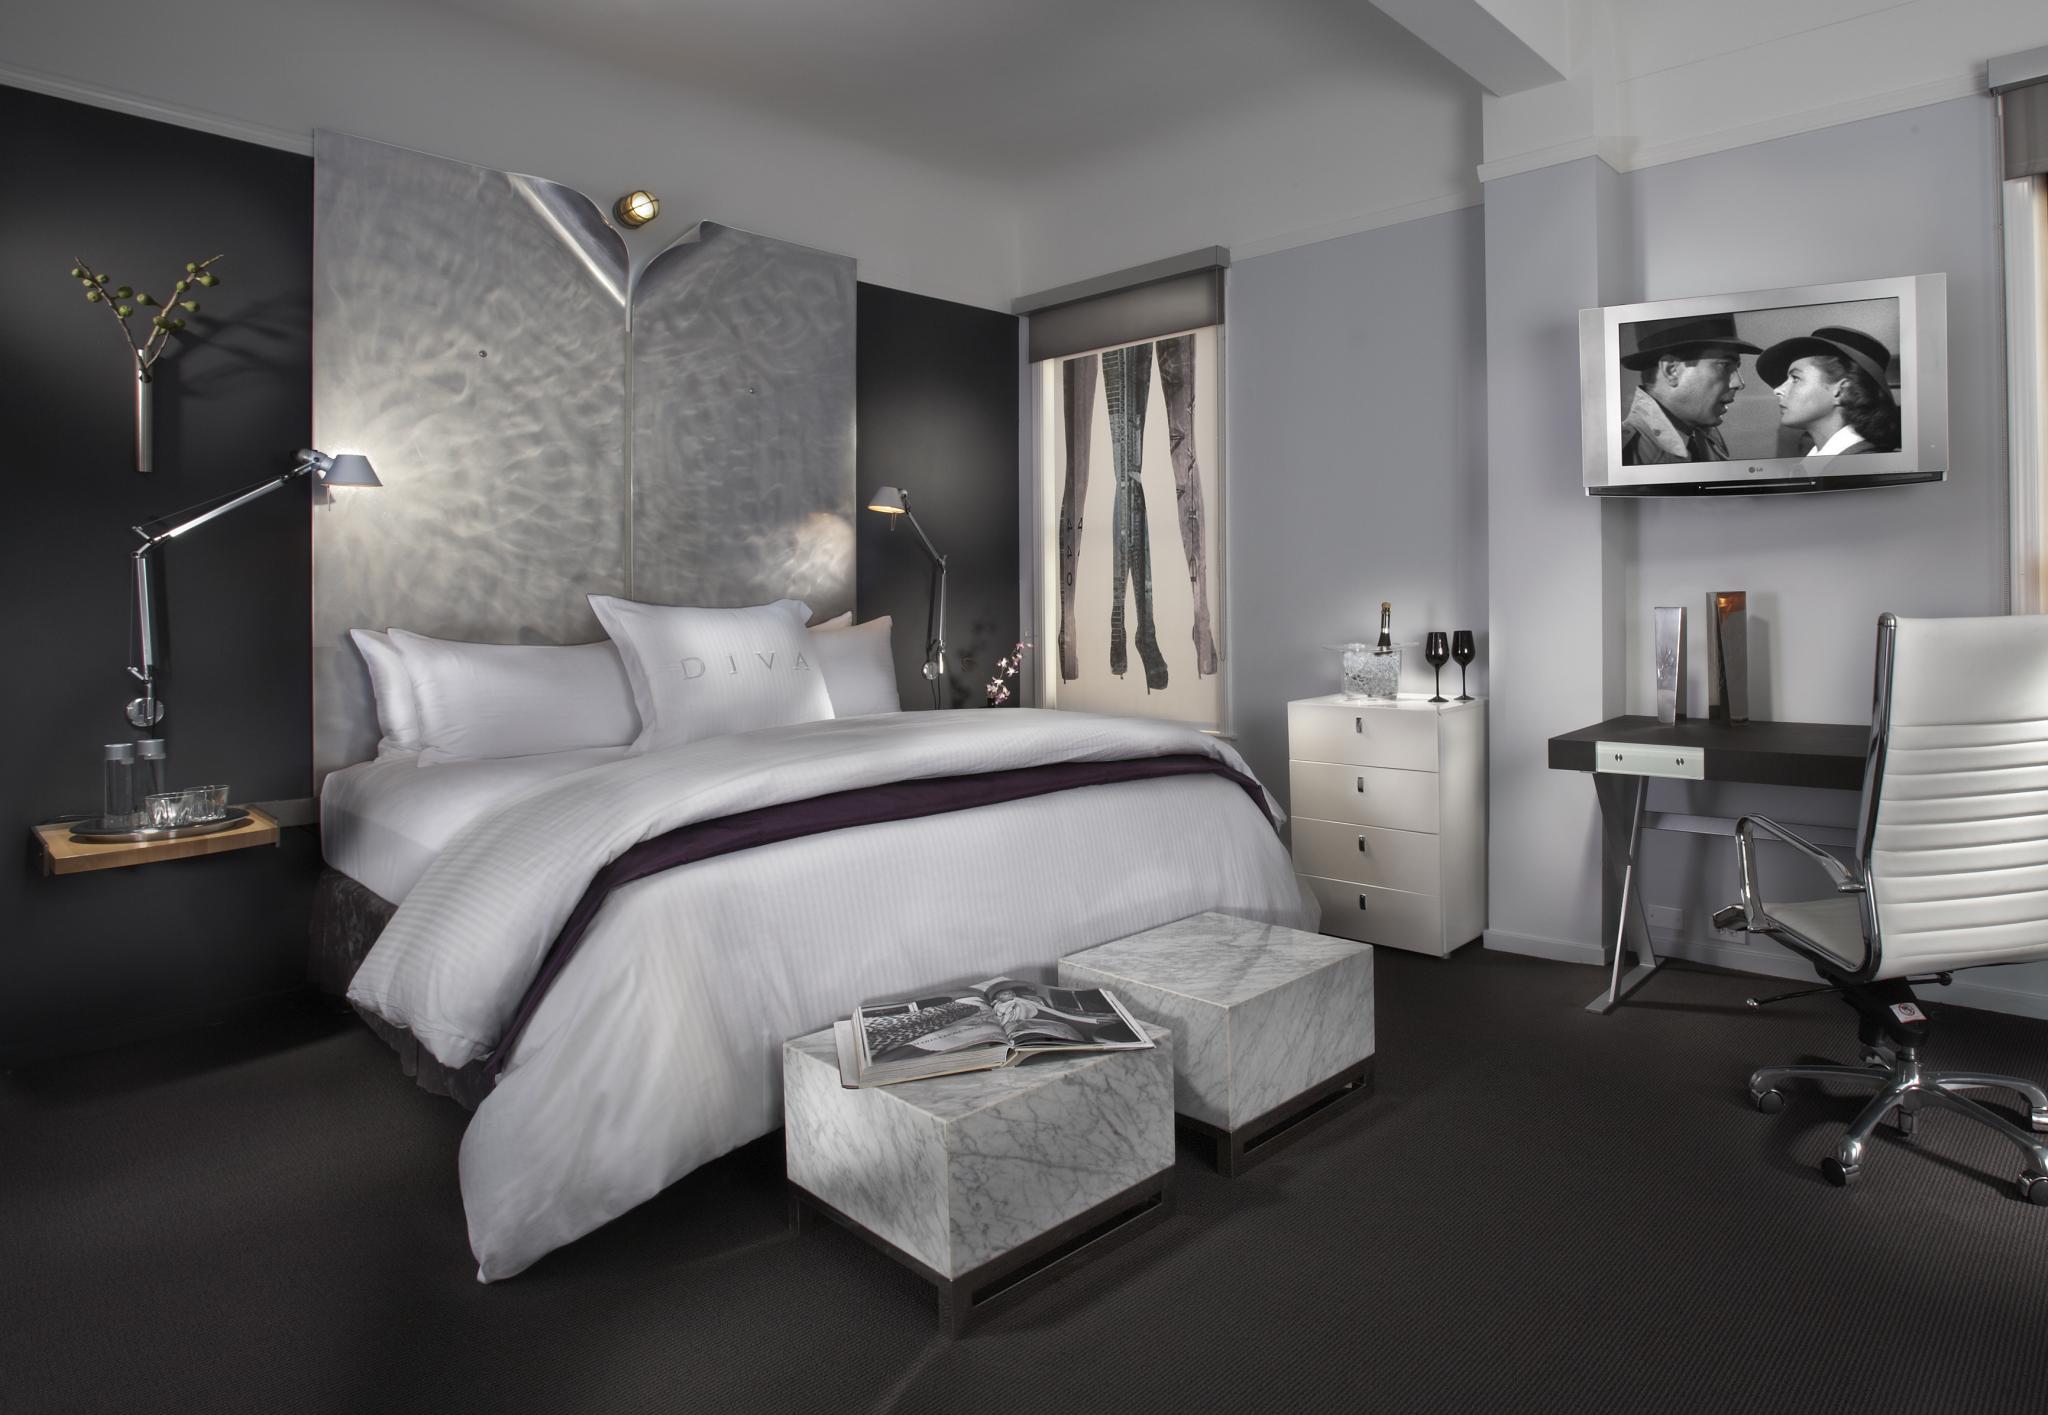 hotel diva a san francisco hotel announces special. Black Bedroom Furniture Sets. Home Design Ideas